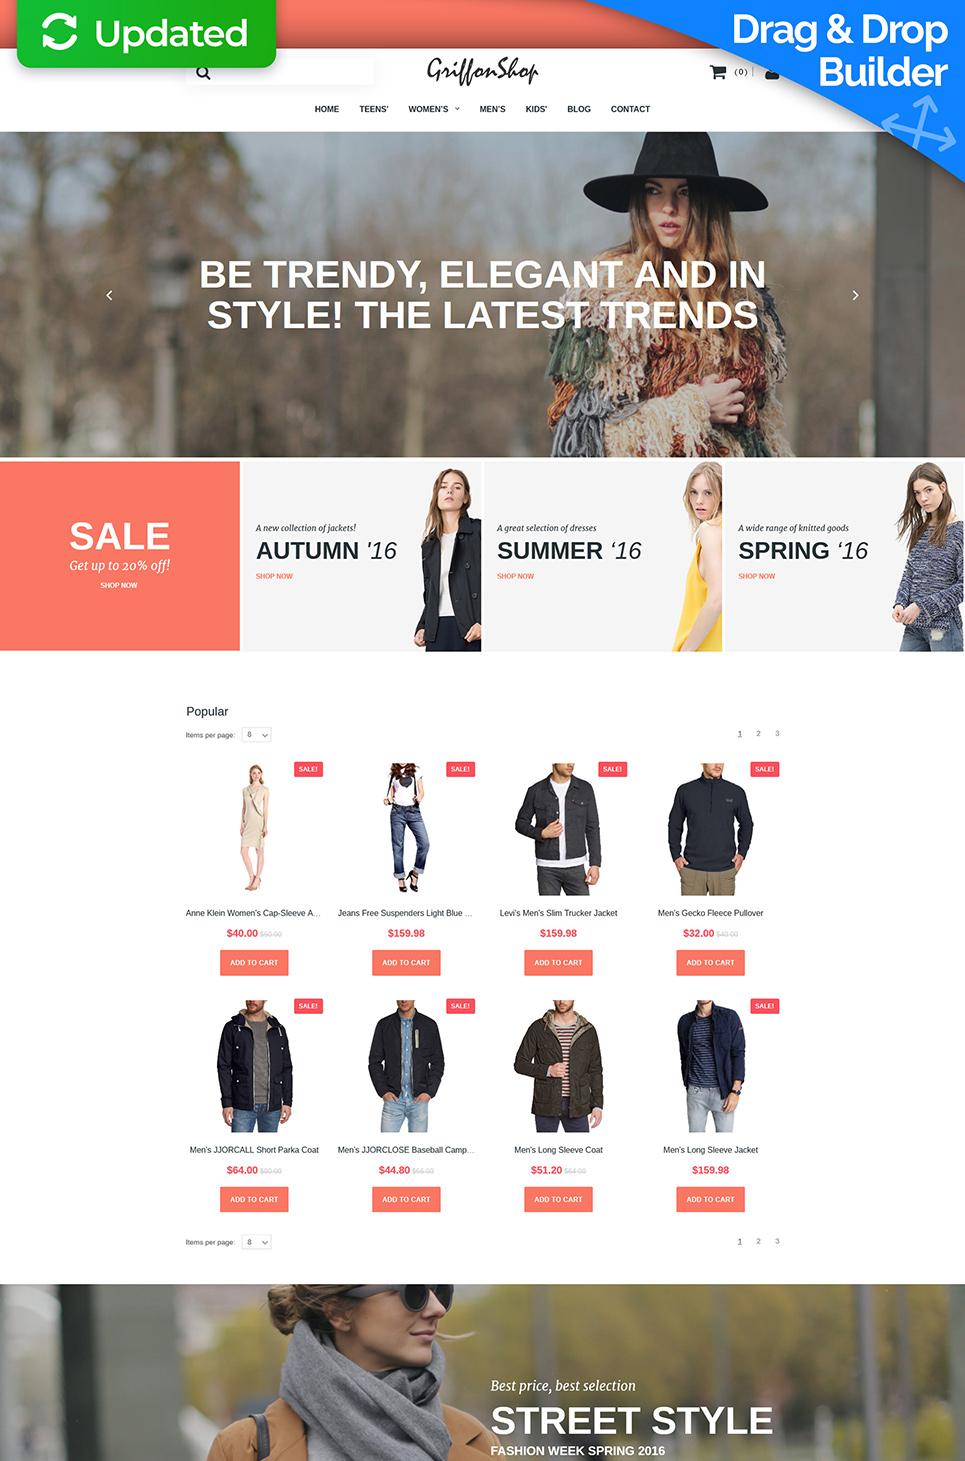 Grillon Shop Ecommerce Website Template - image